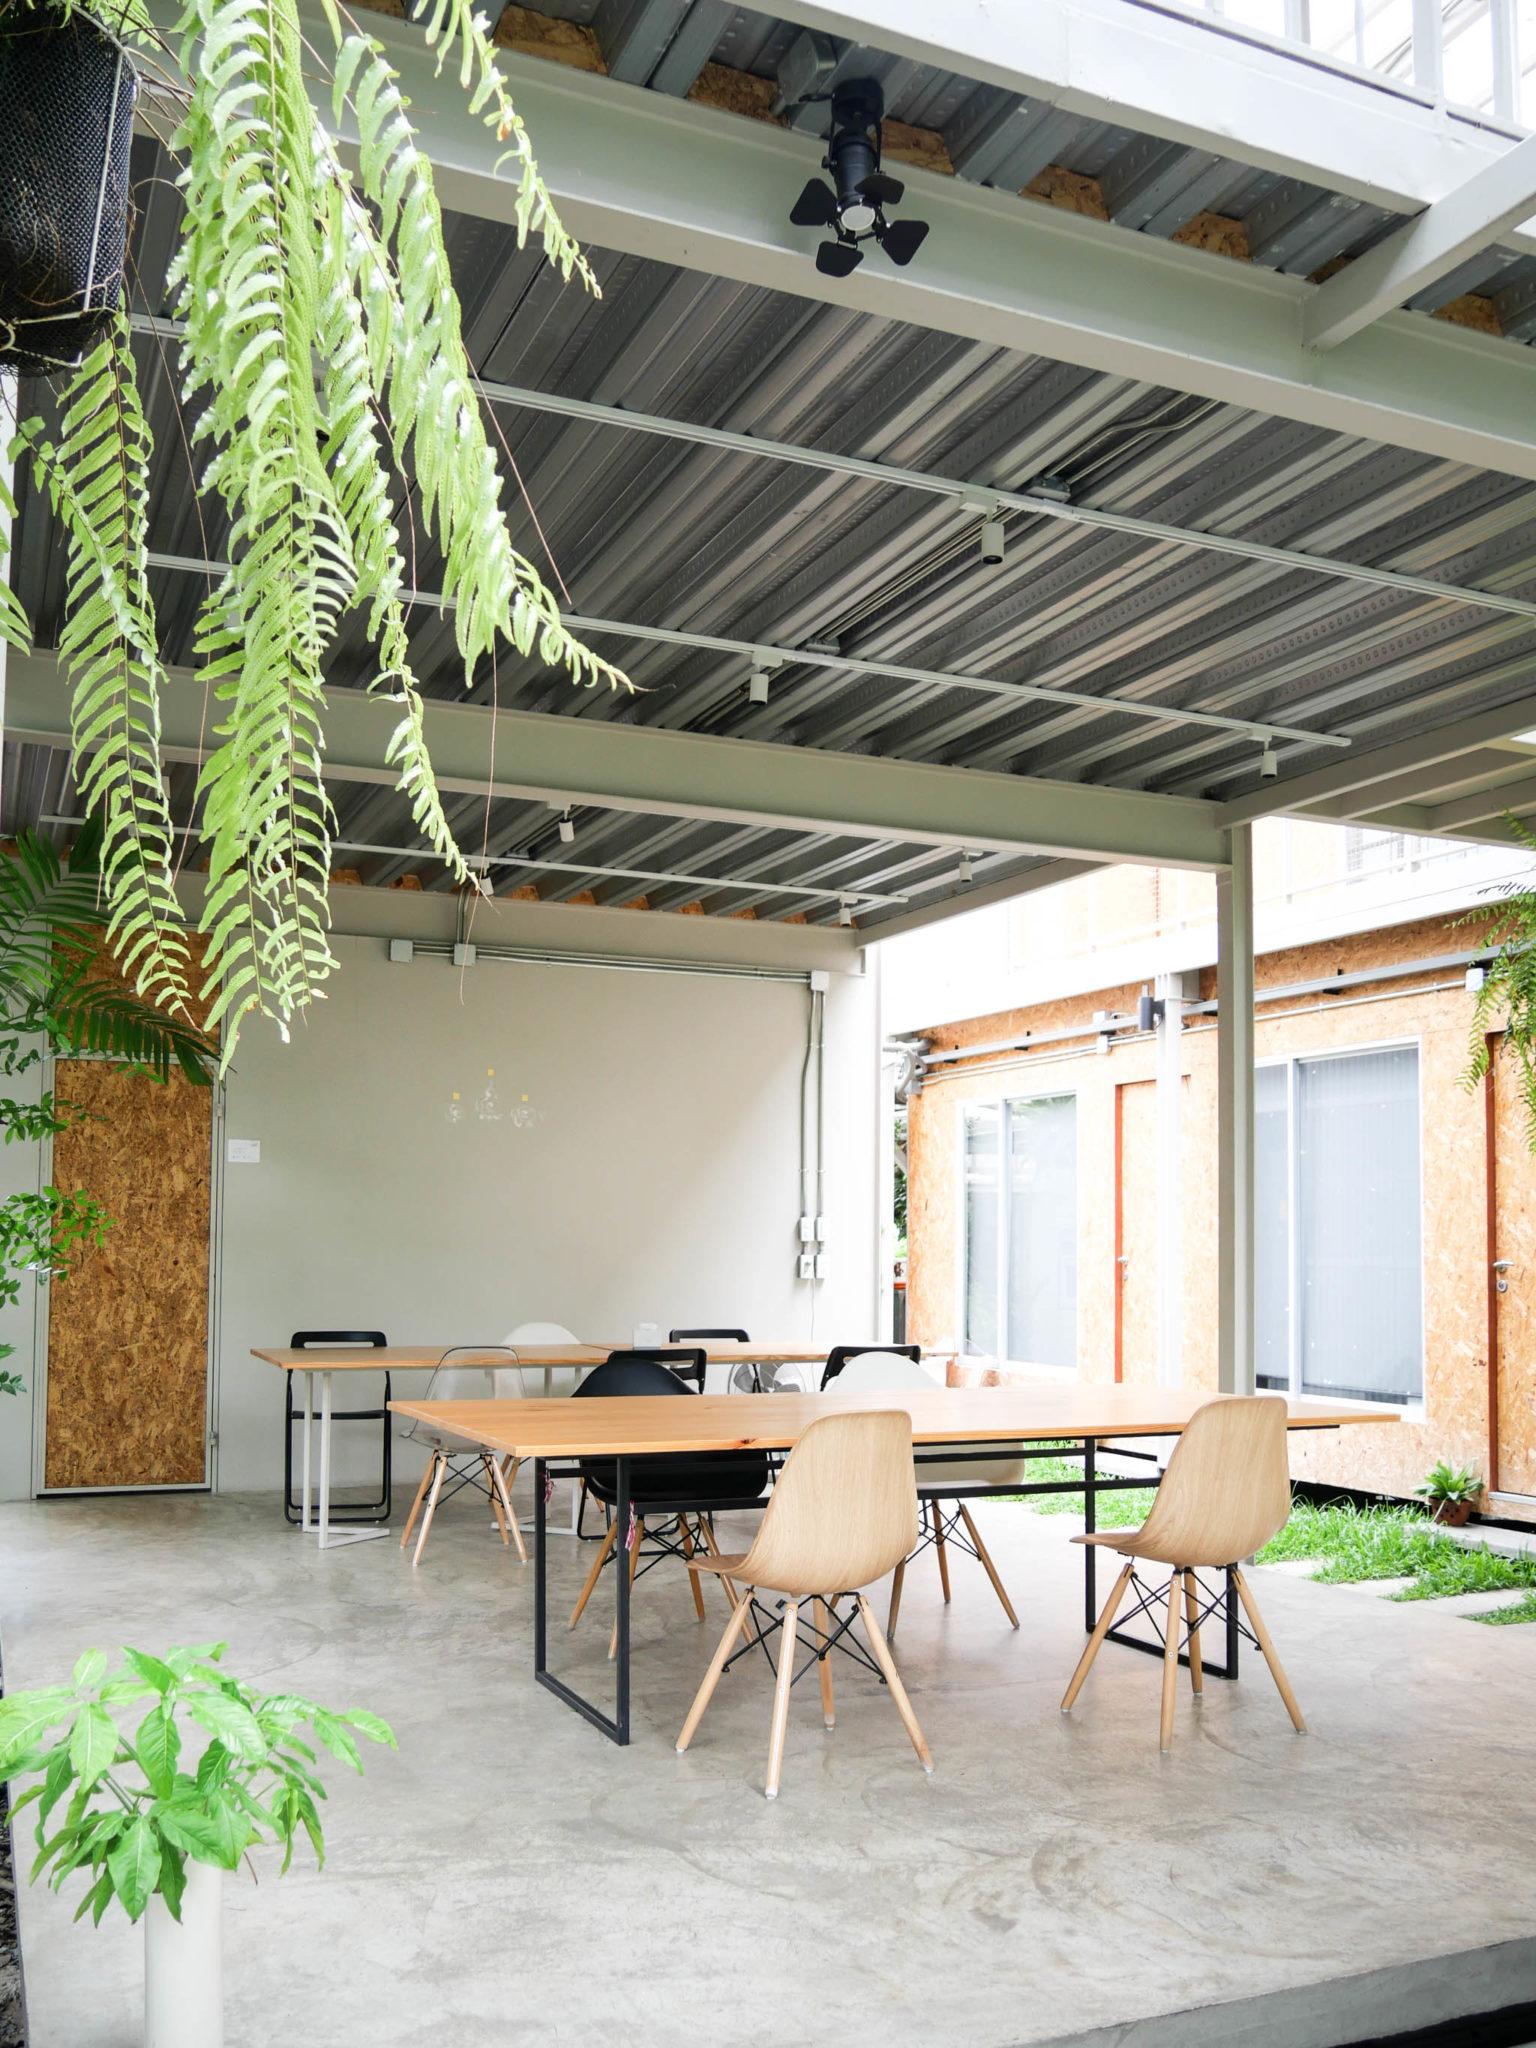 "7 Simply Creative Cafe & Bar ในย่านไลฟ์สไลต์สุดฮิป กับ 24 Hr. Co-Working Space กลาง New Interchange ""รัชดา - ลาดพร้าว"" 16 - cafe"